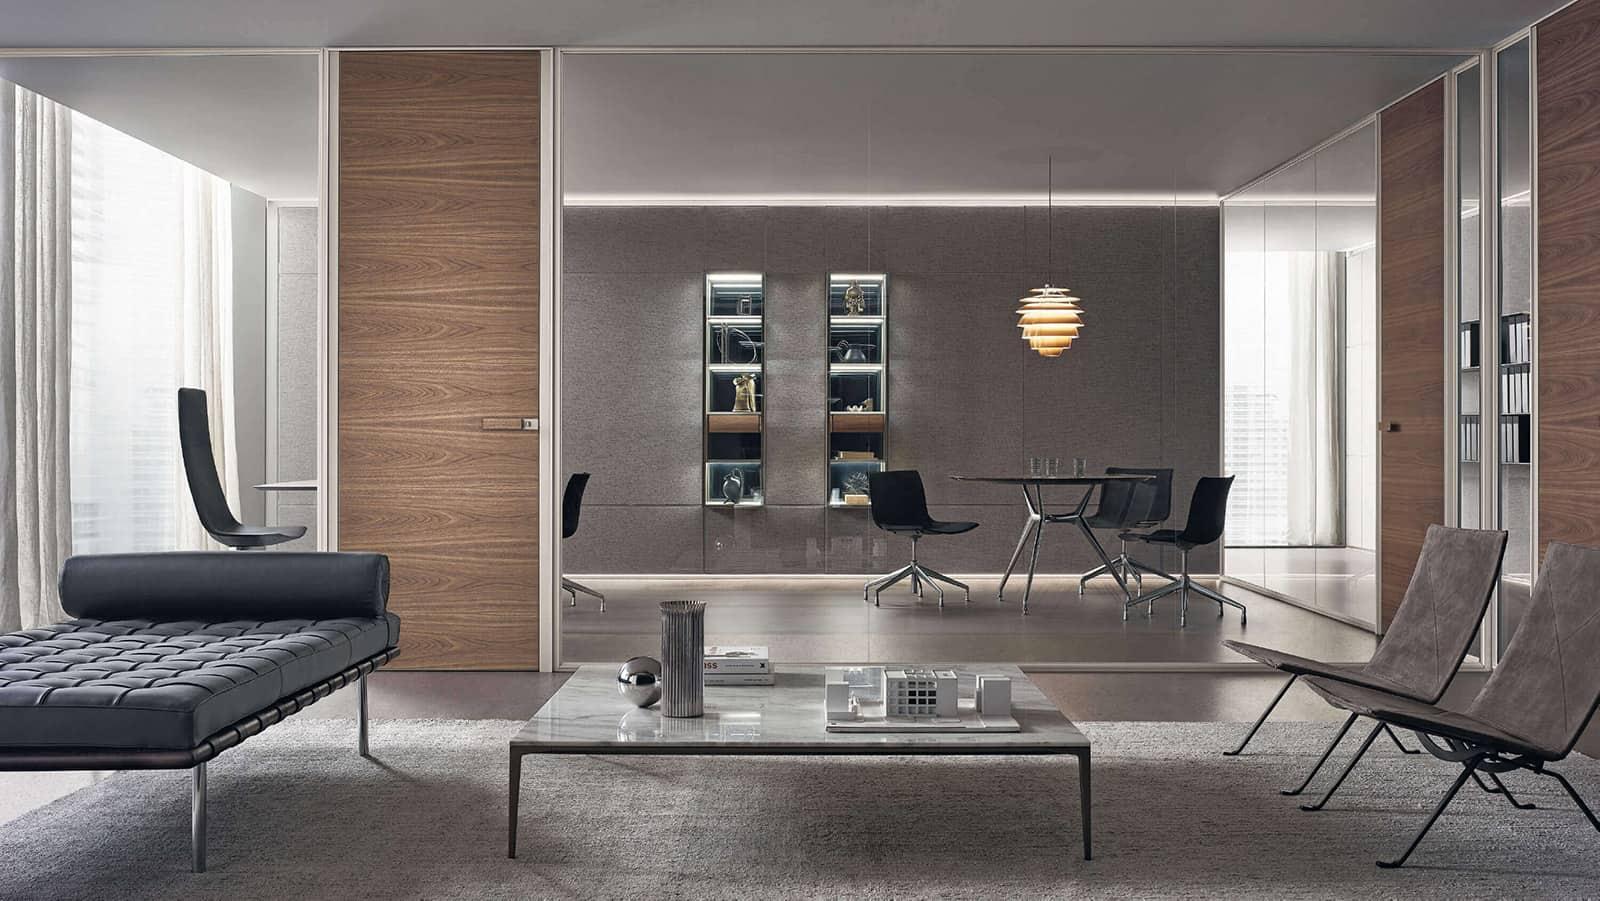 design-akoestische-wandpanelen-interieurpanelen-kantoor-rimadesio-modulor